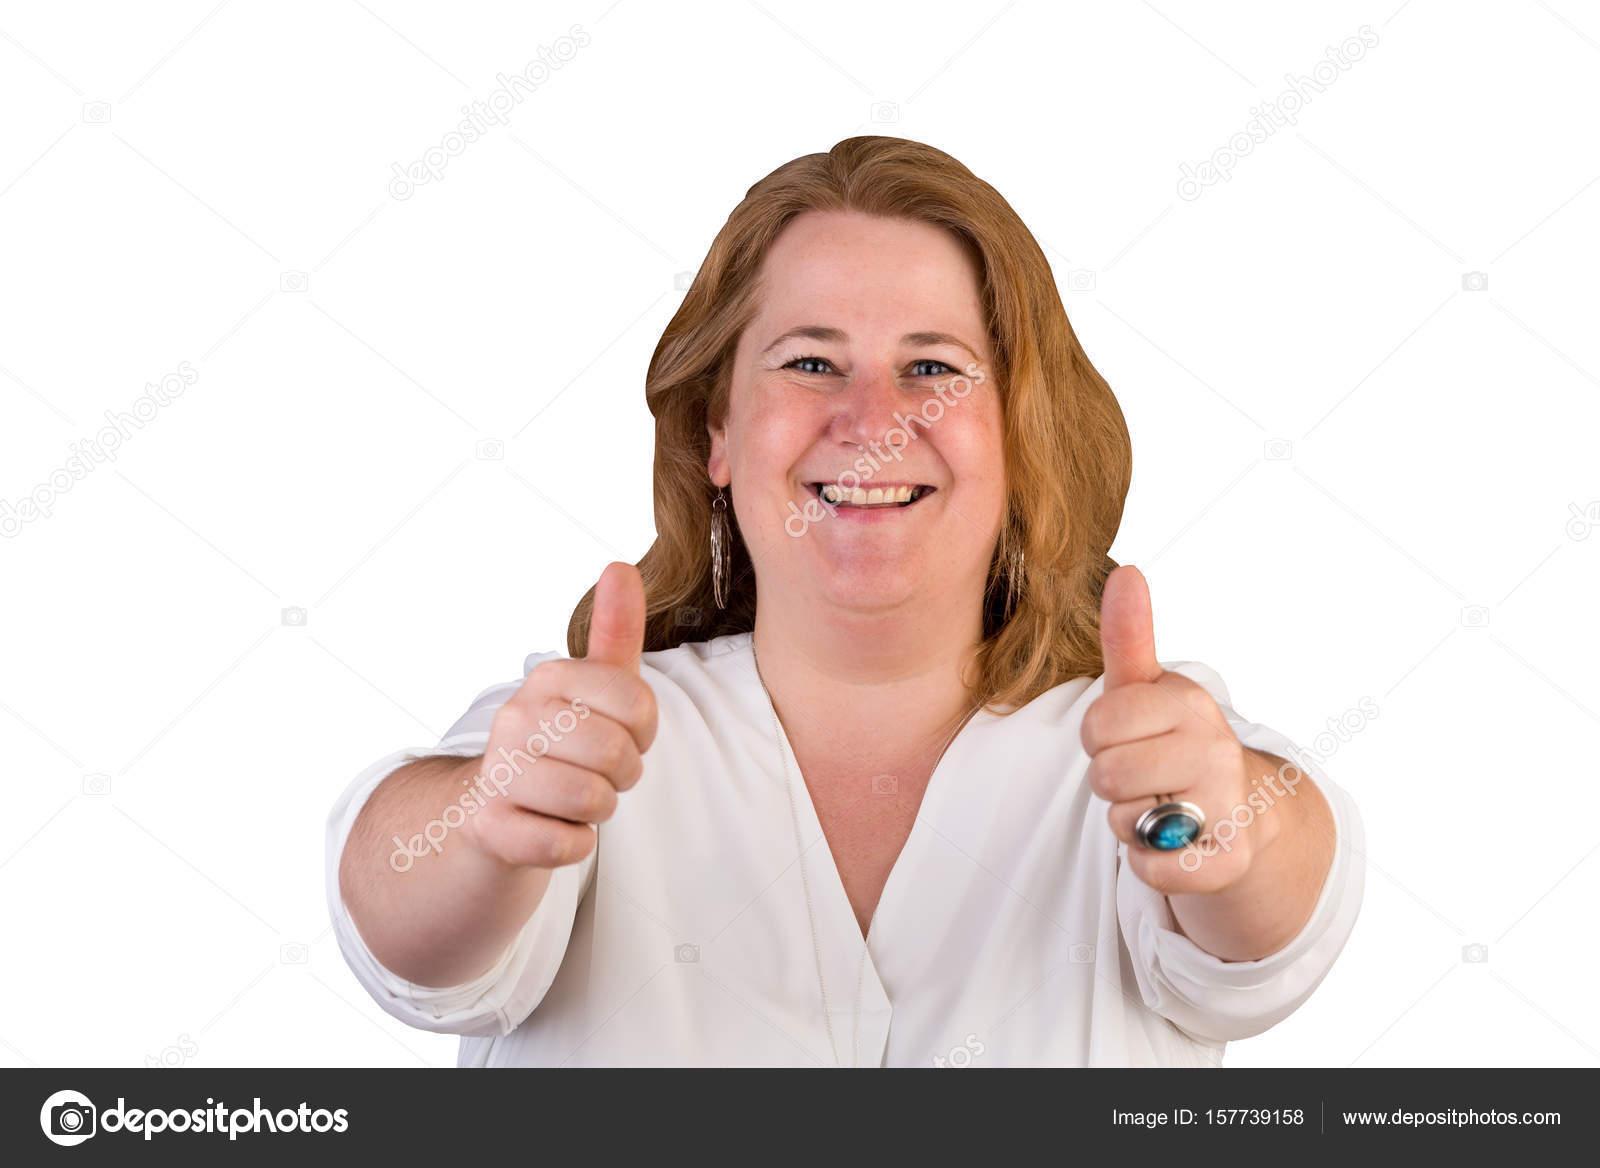 ee9611cc7815 Πορτρέτο του ένα ελκυστικό ευρωπαϊκό ελαφρύ υπέρβαρος κόκκινα μαλλιά  γυναίκα σε άσπρο πουκάμισο δείχνει τους αντίχειρες επάνω